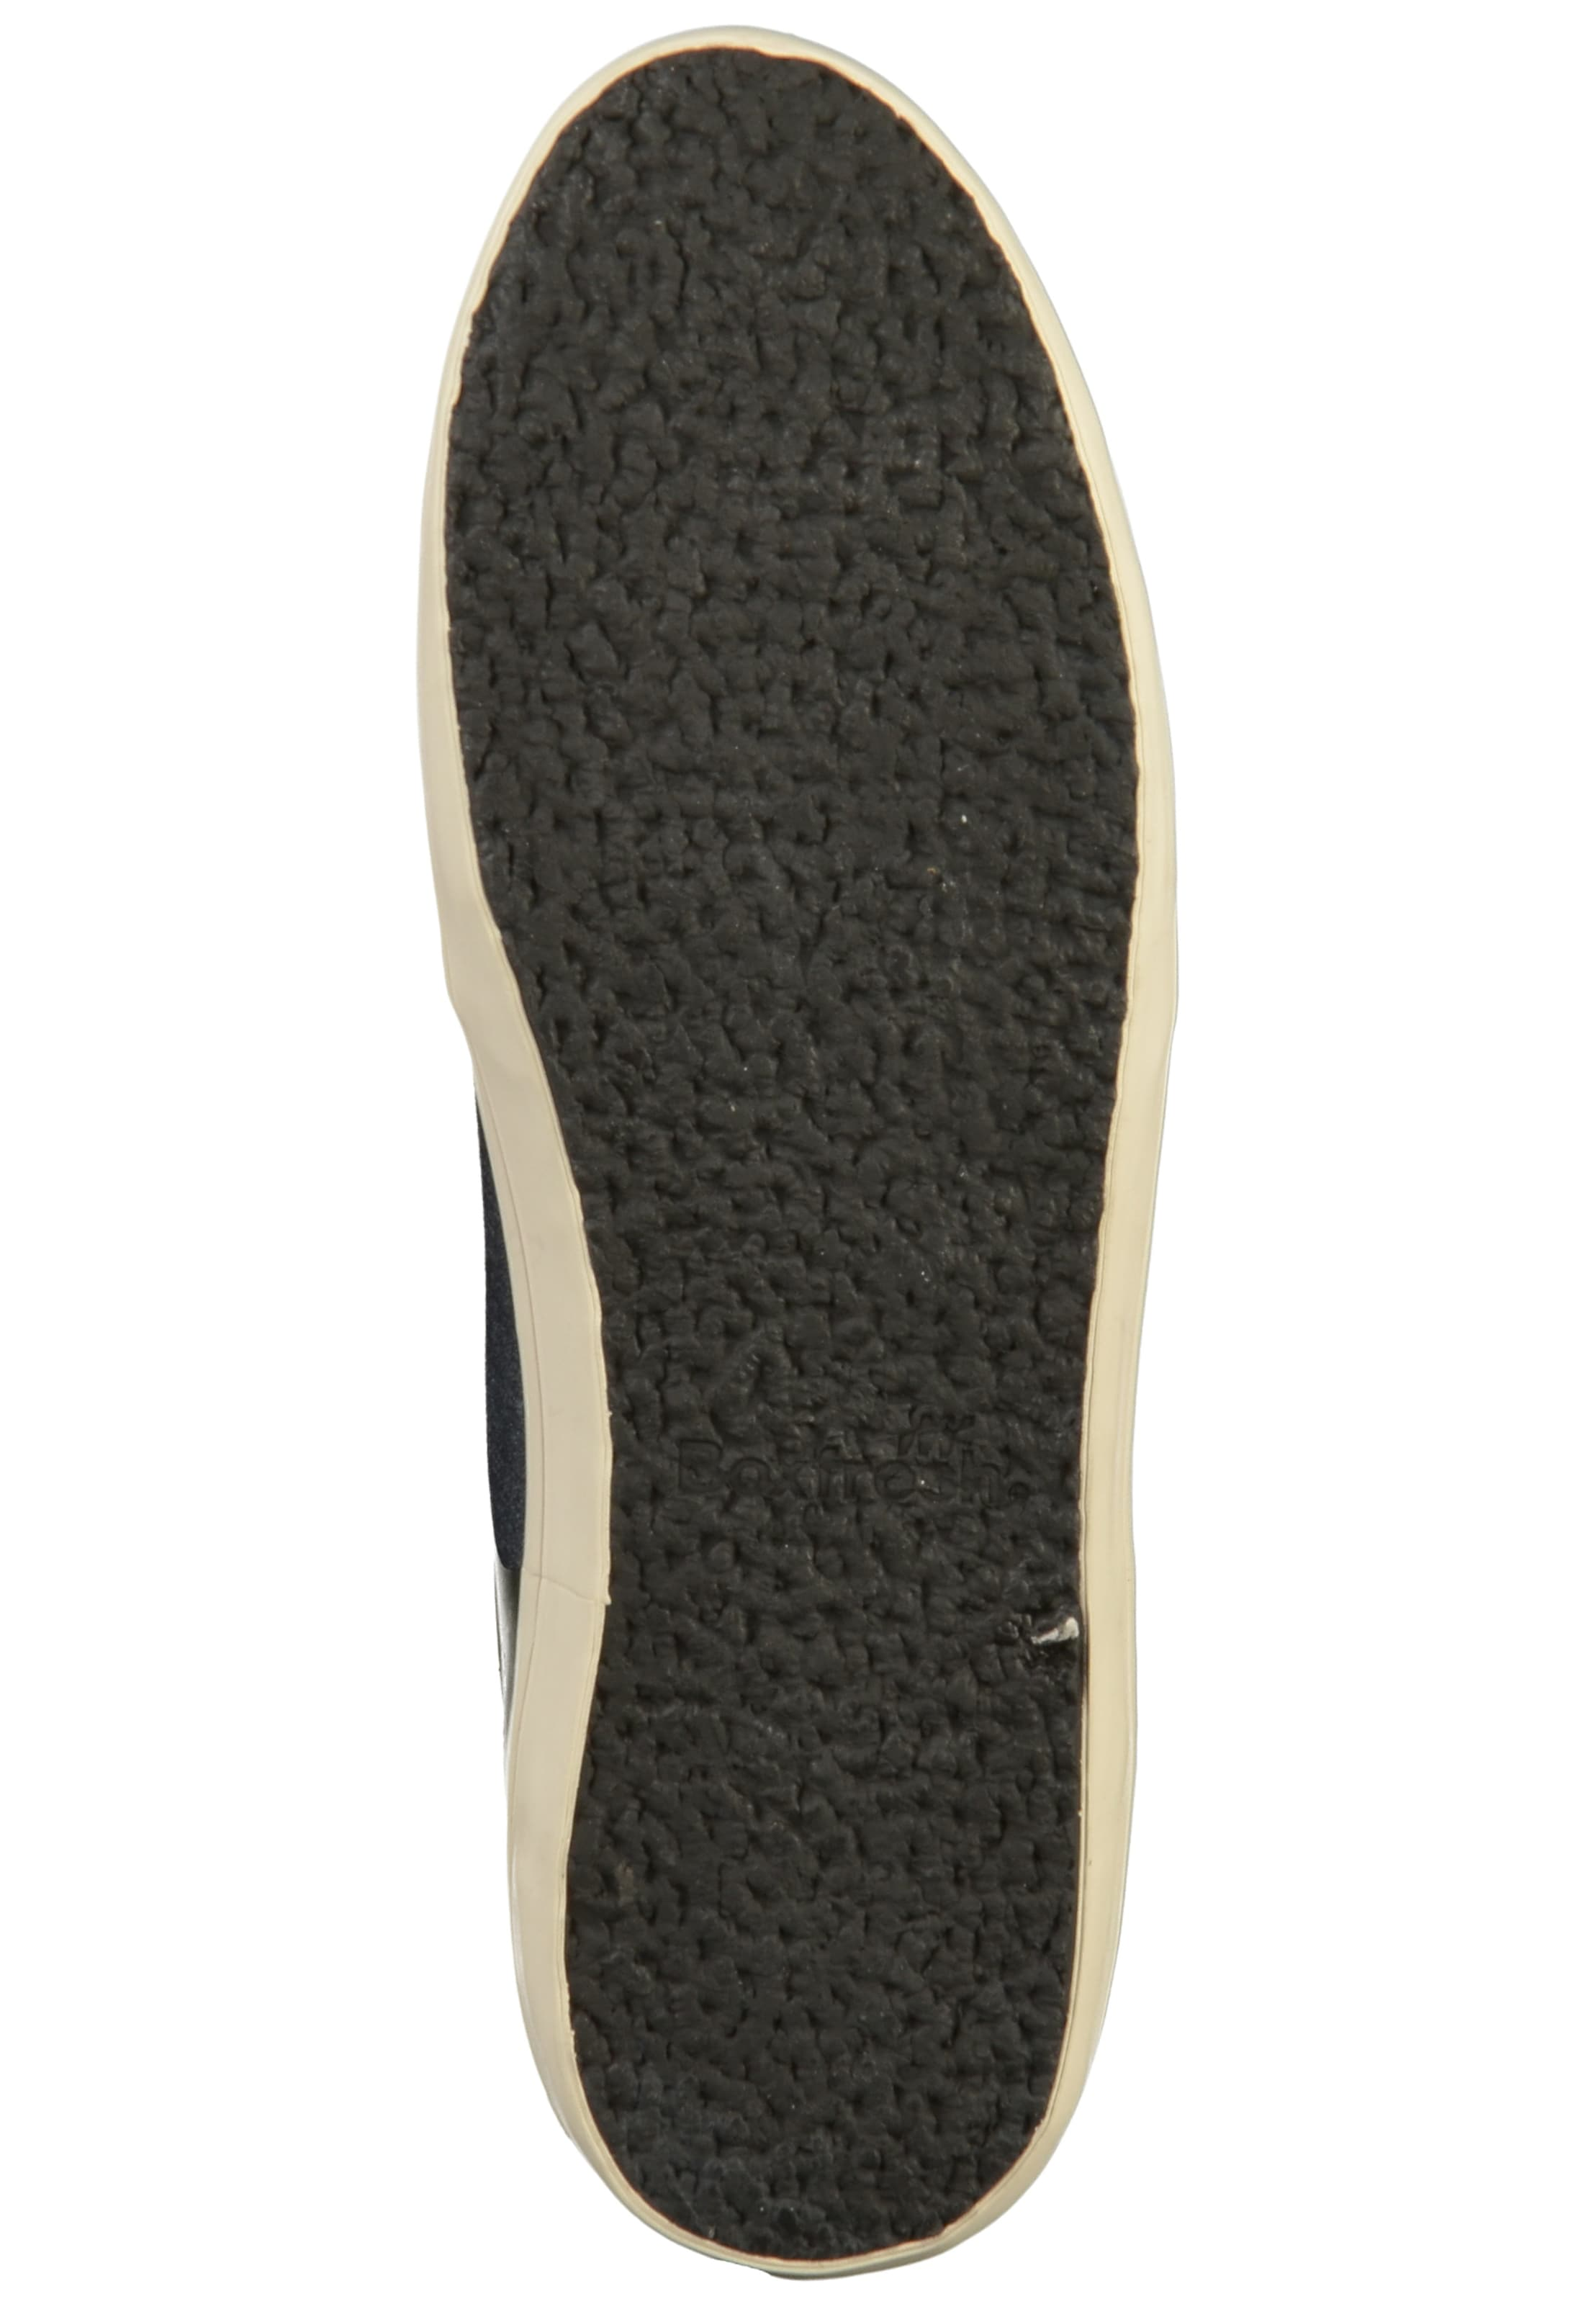 BOXFRESH Turnschuhe Textil, Material sonstiges Material Textil, Markenrabatt 361547